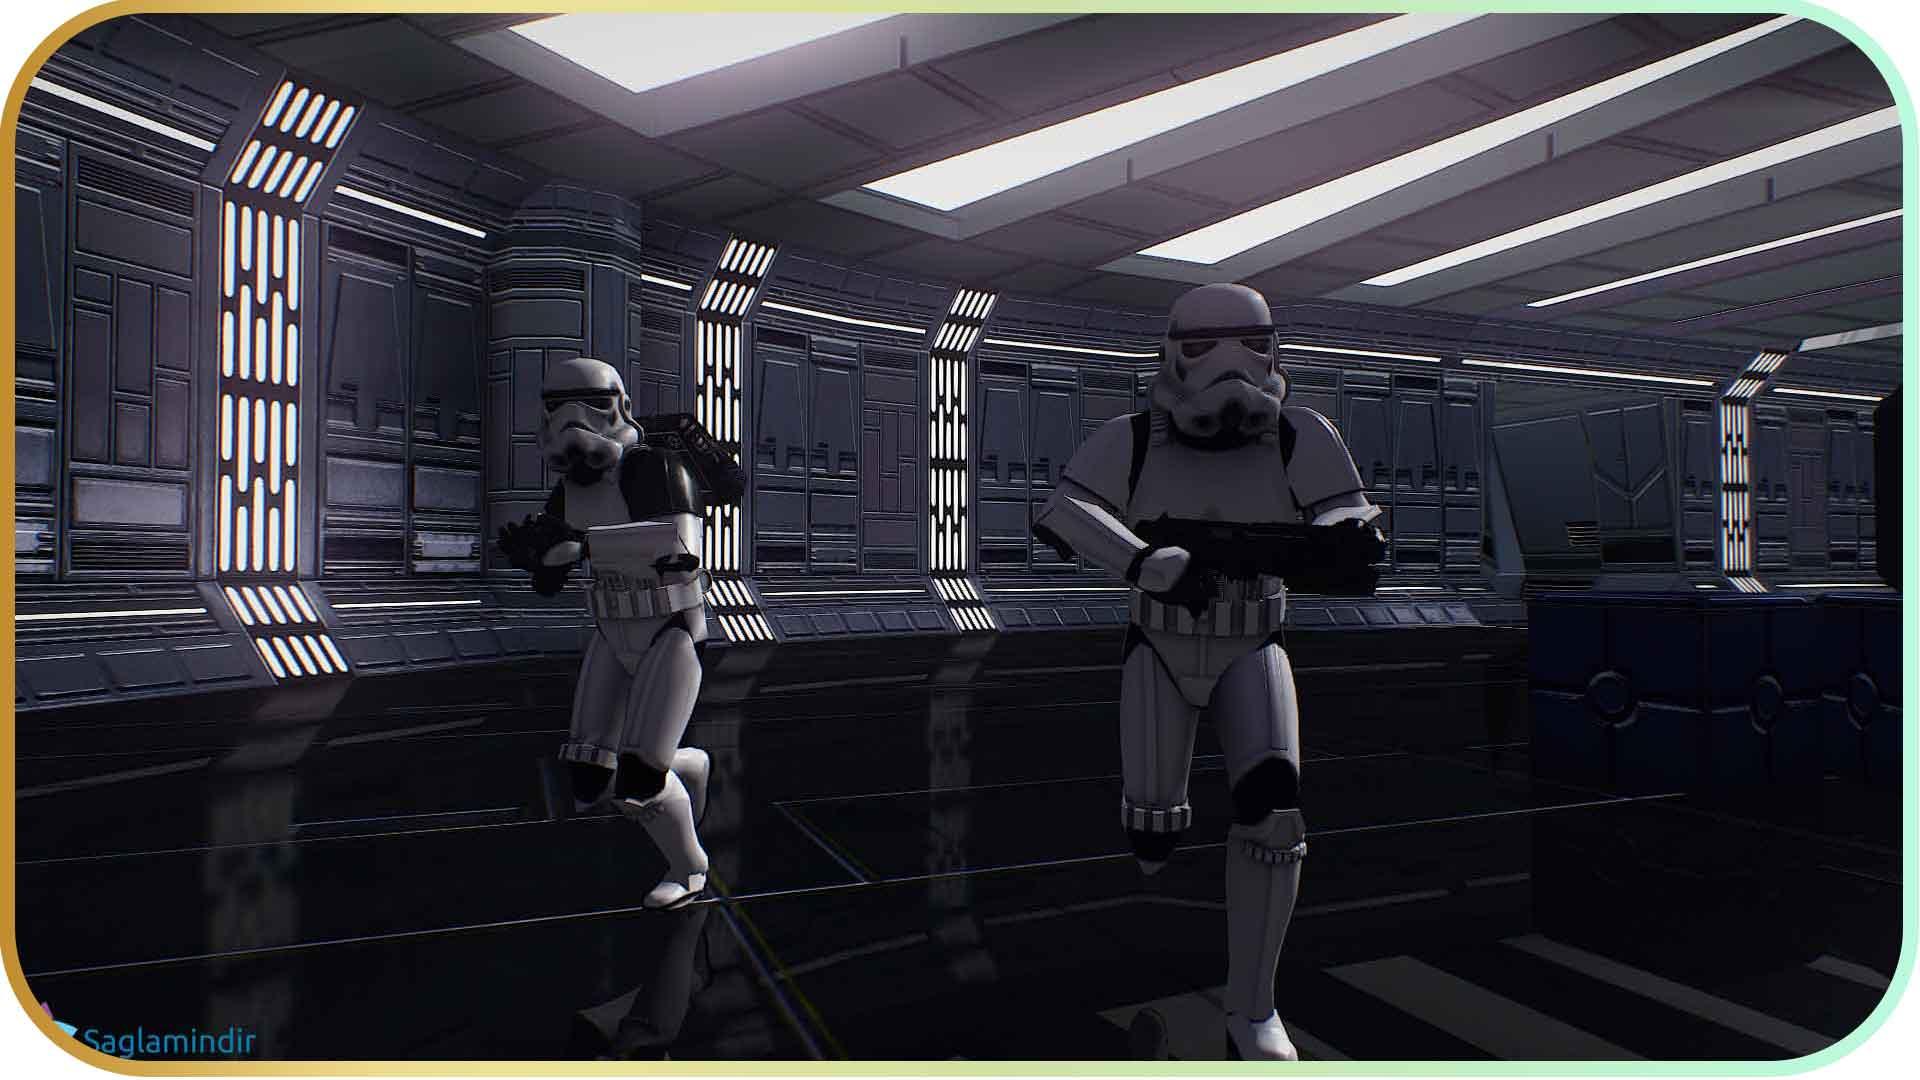 Star Wars Battlefront 2 Classic saglamindir